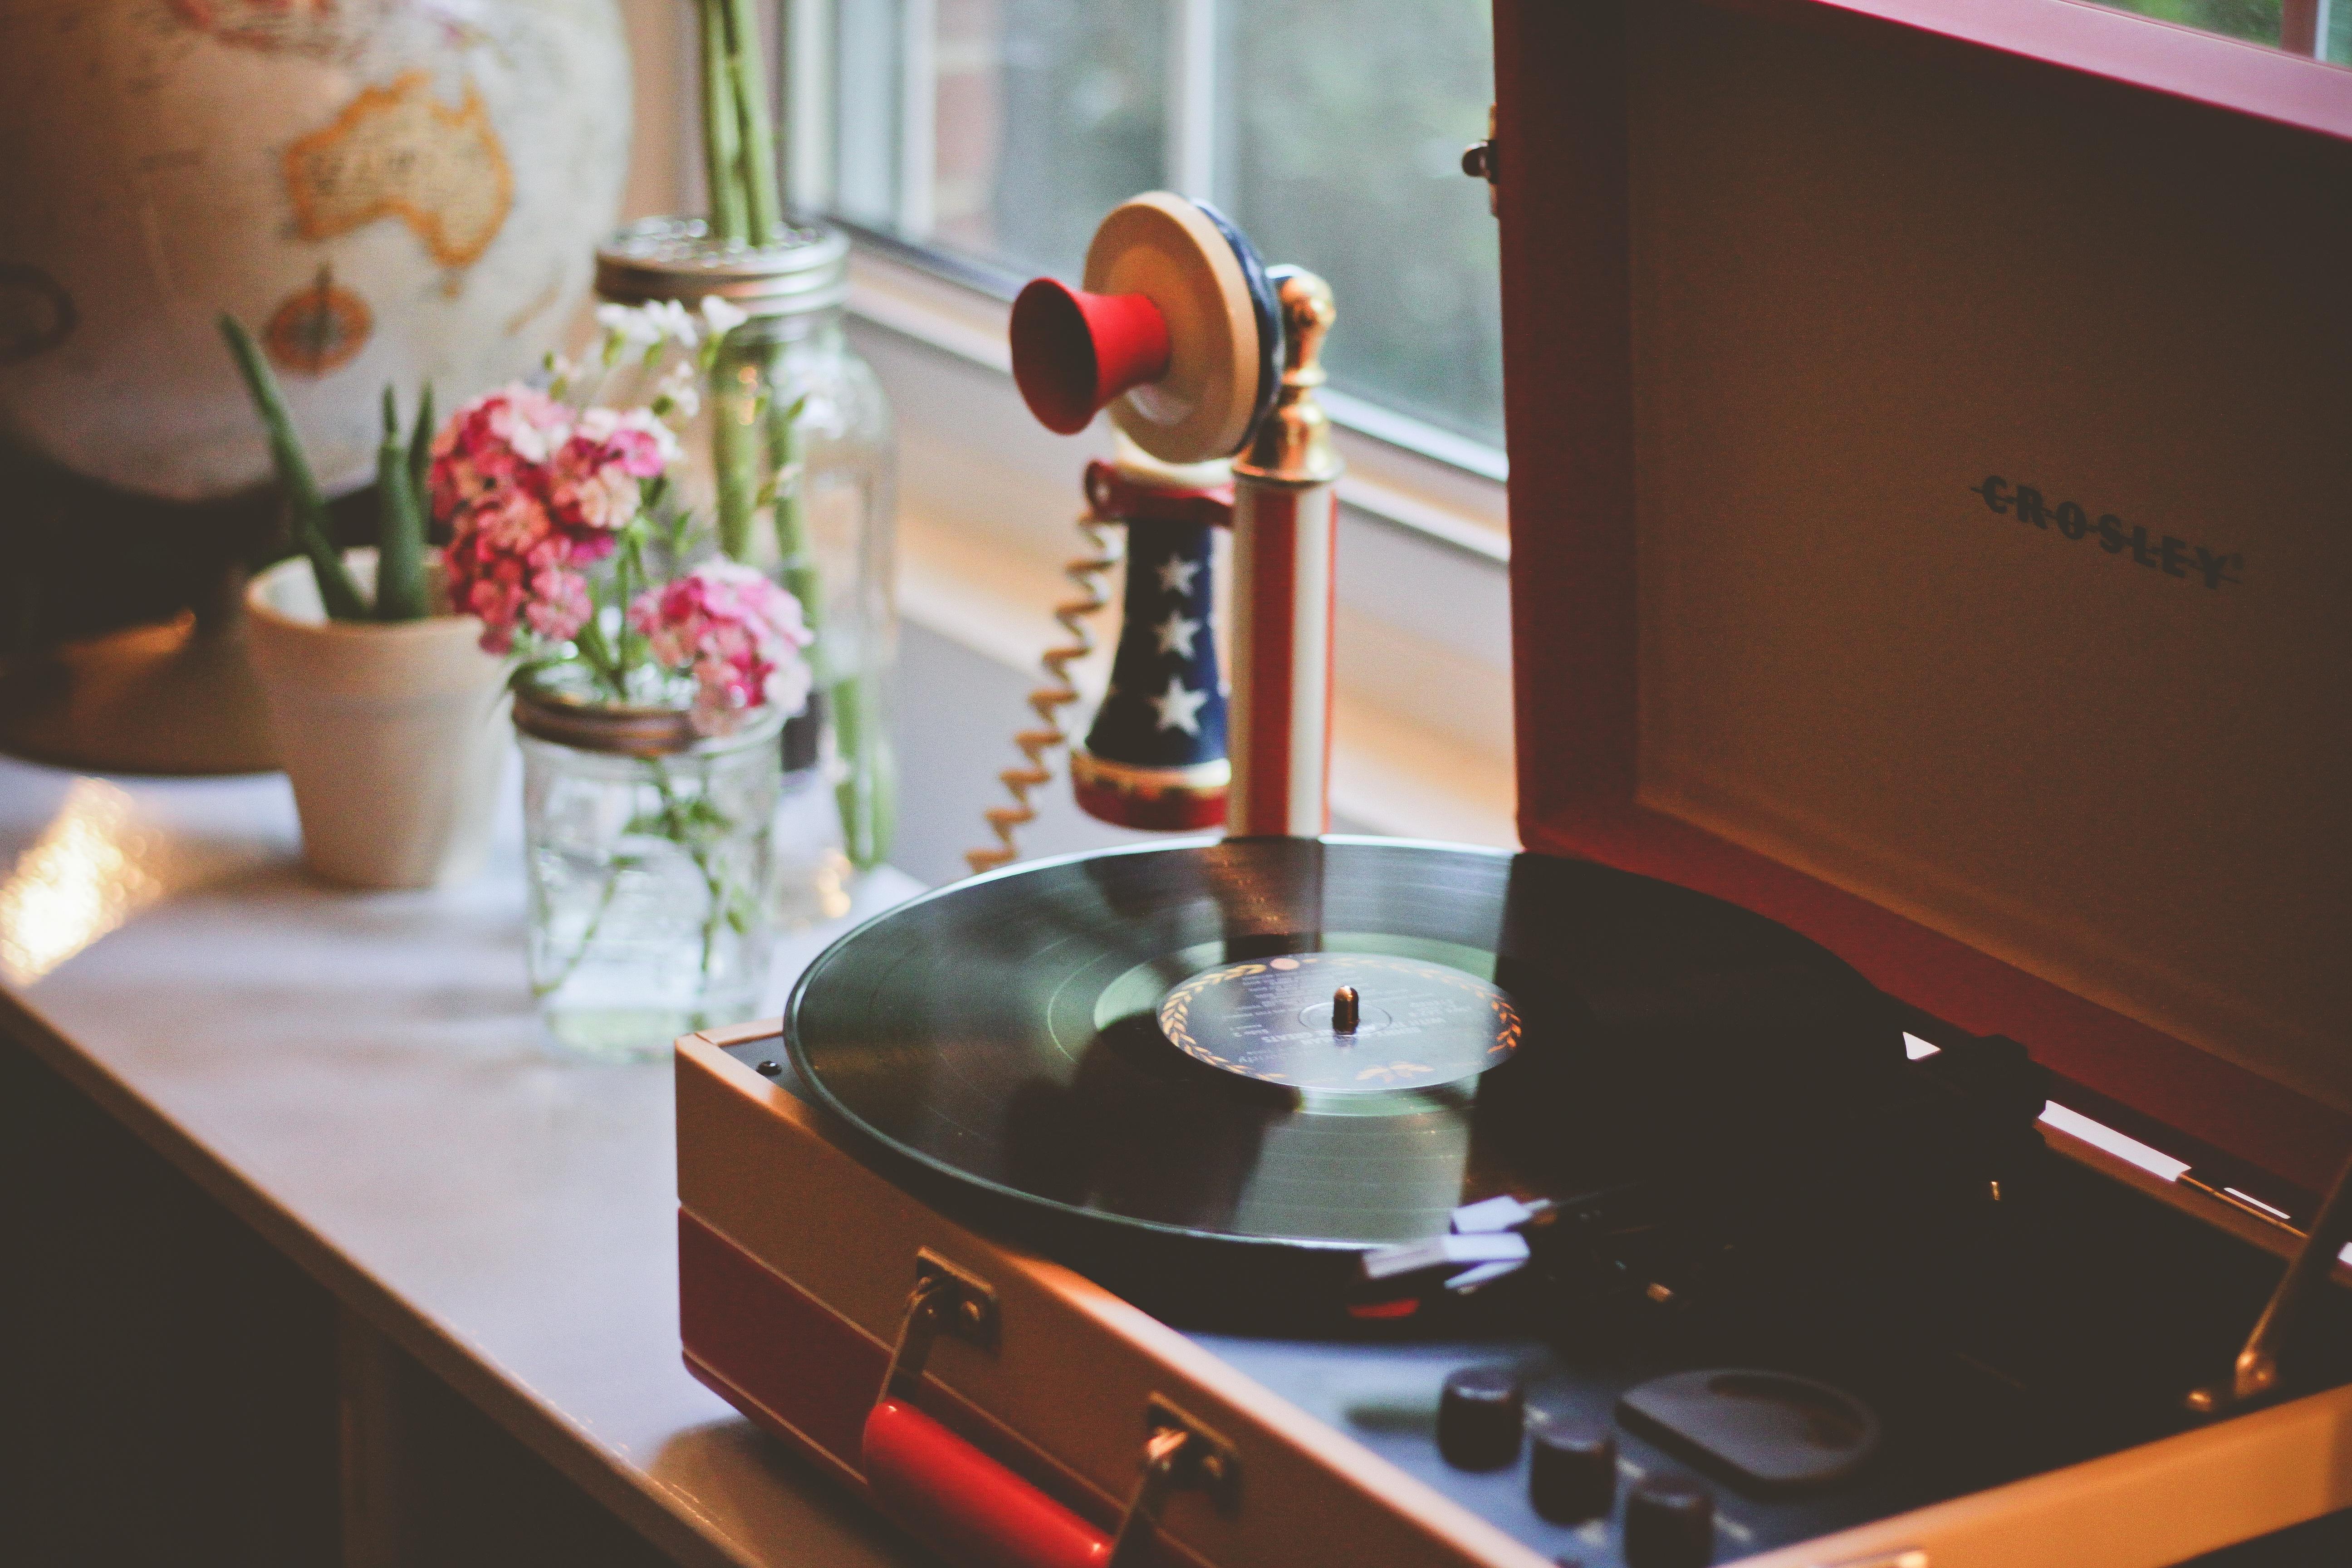 Fotos gratis : mesa, grabar, flor, cocina, mueble, habitación ...